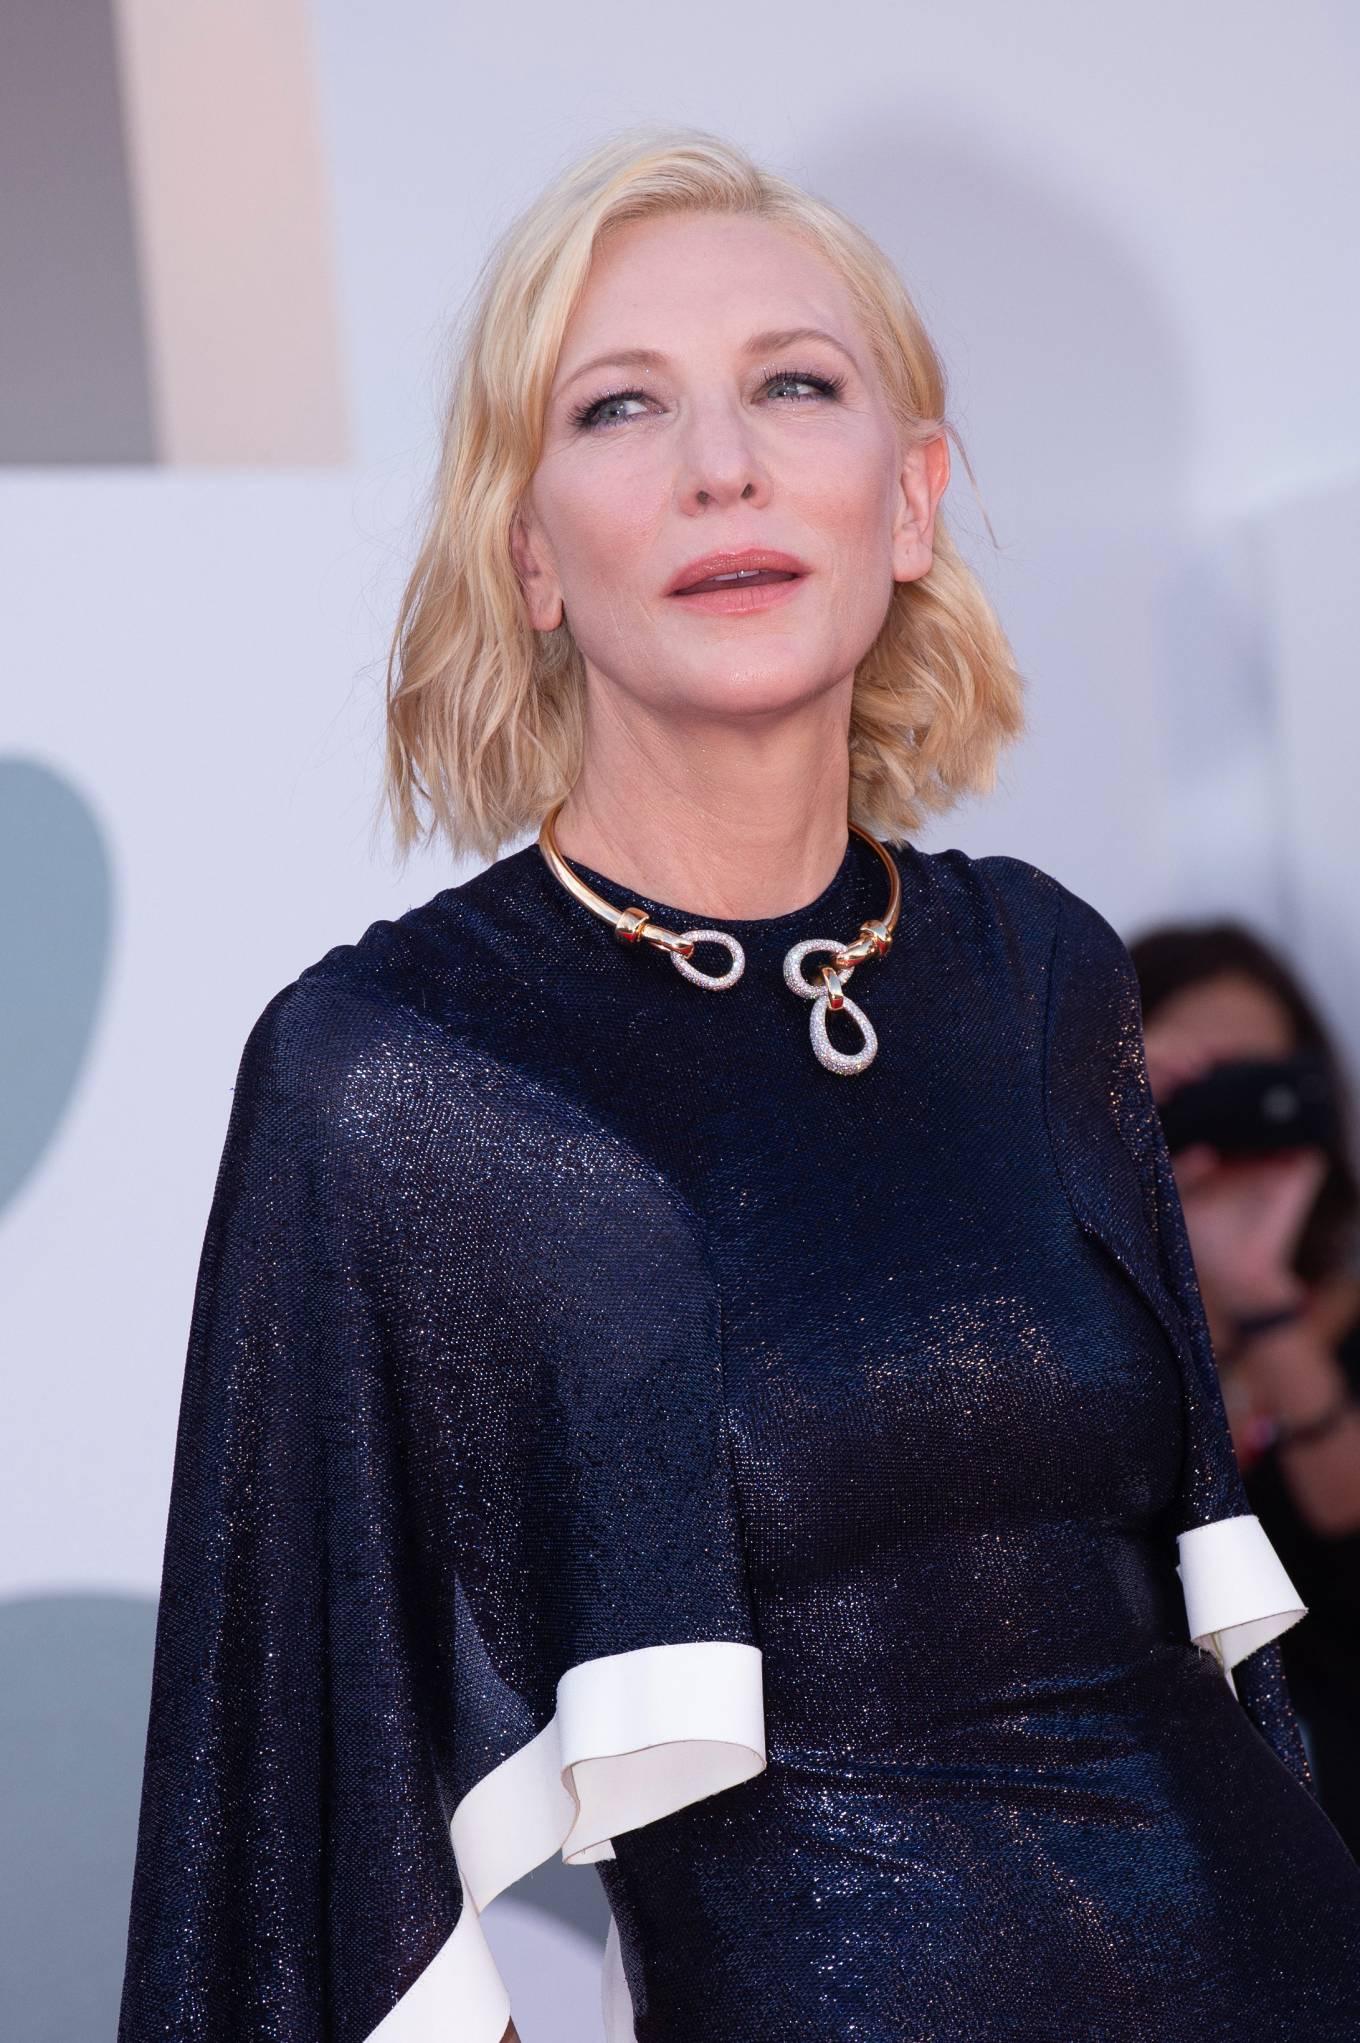 Cate Blanchett 2020 : Cate Blanchett attending Opening Ceremony at 2020 Venice International Film Festival – Italy-02